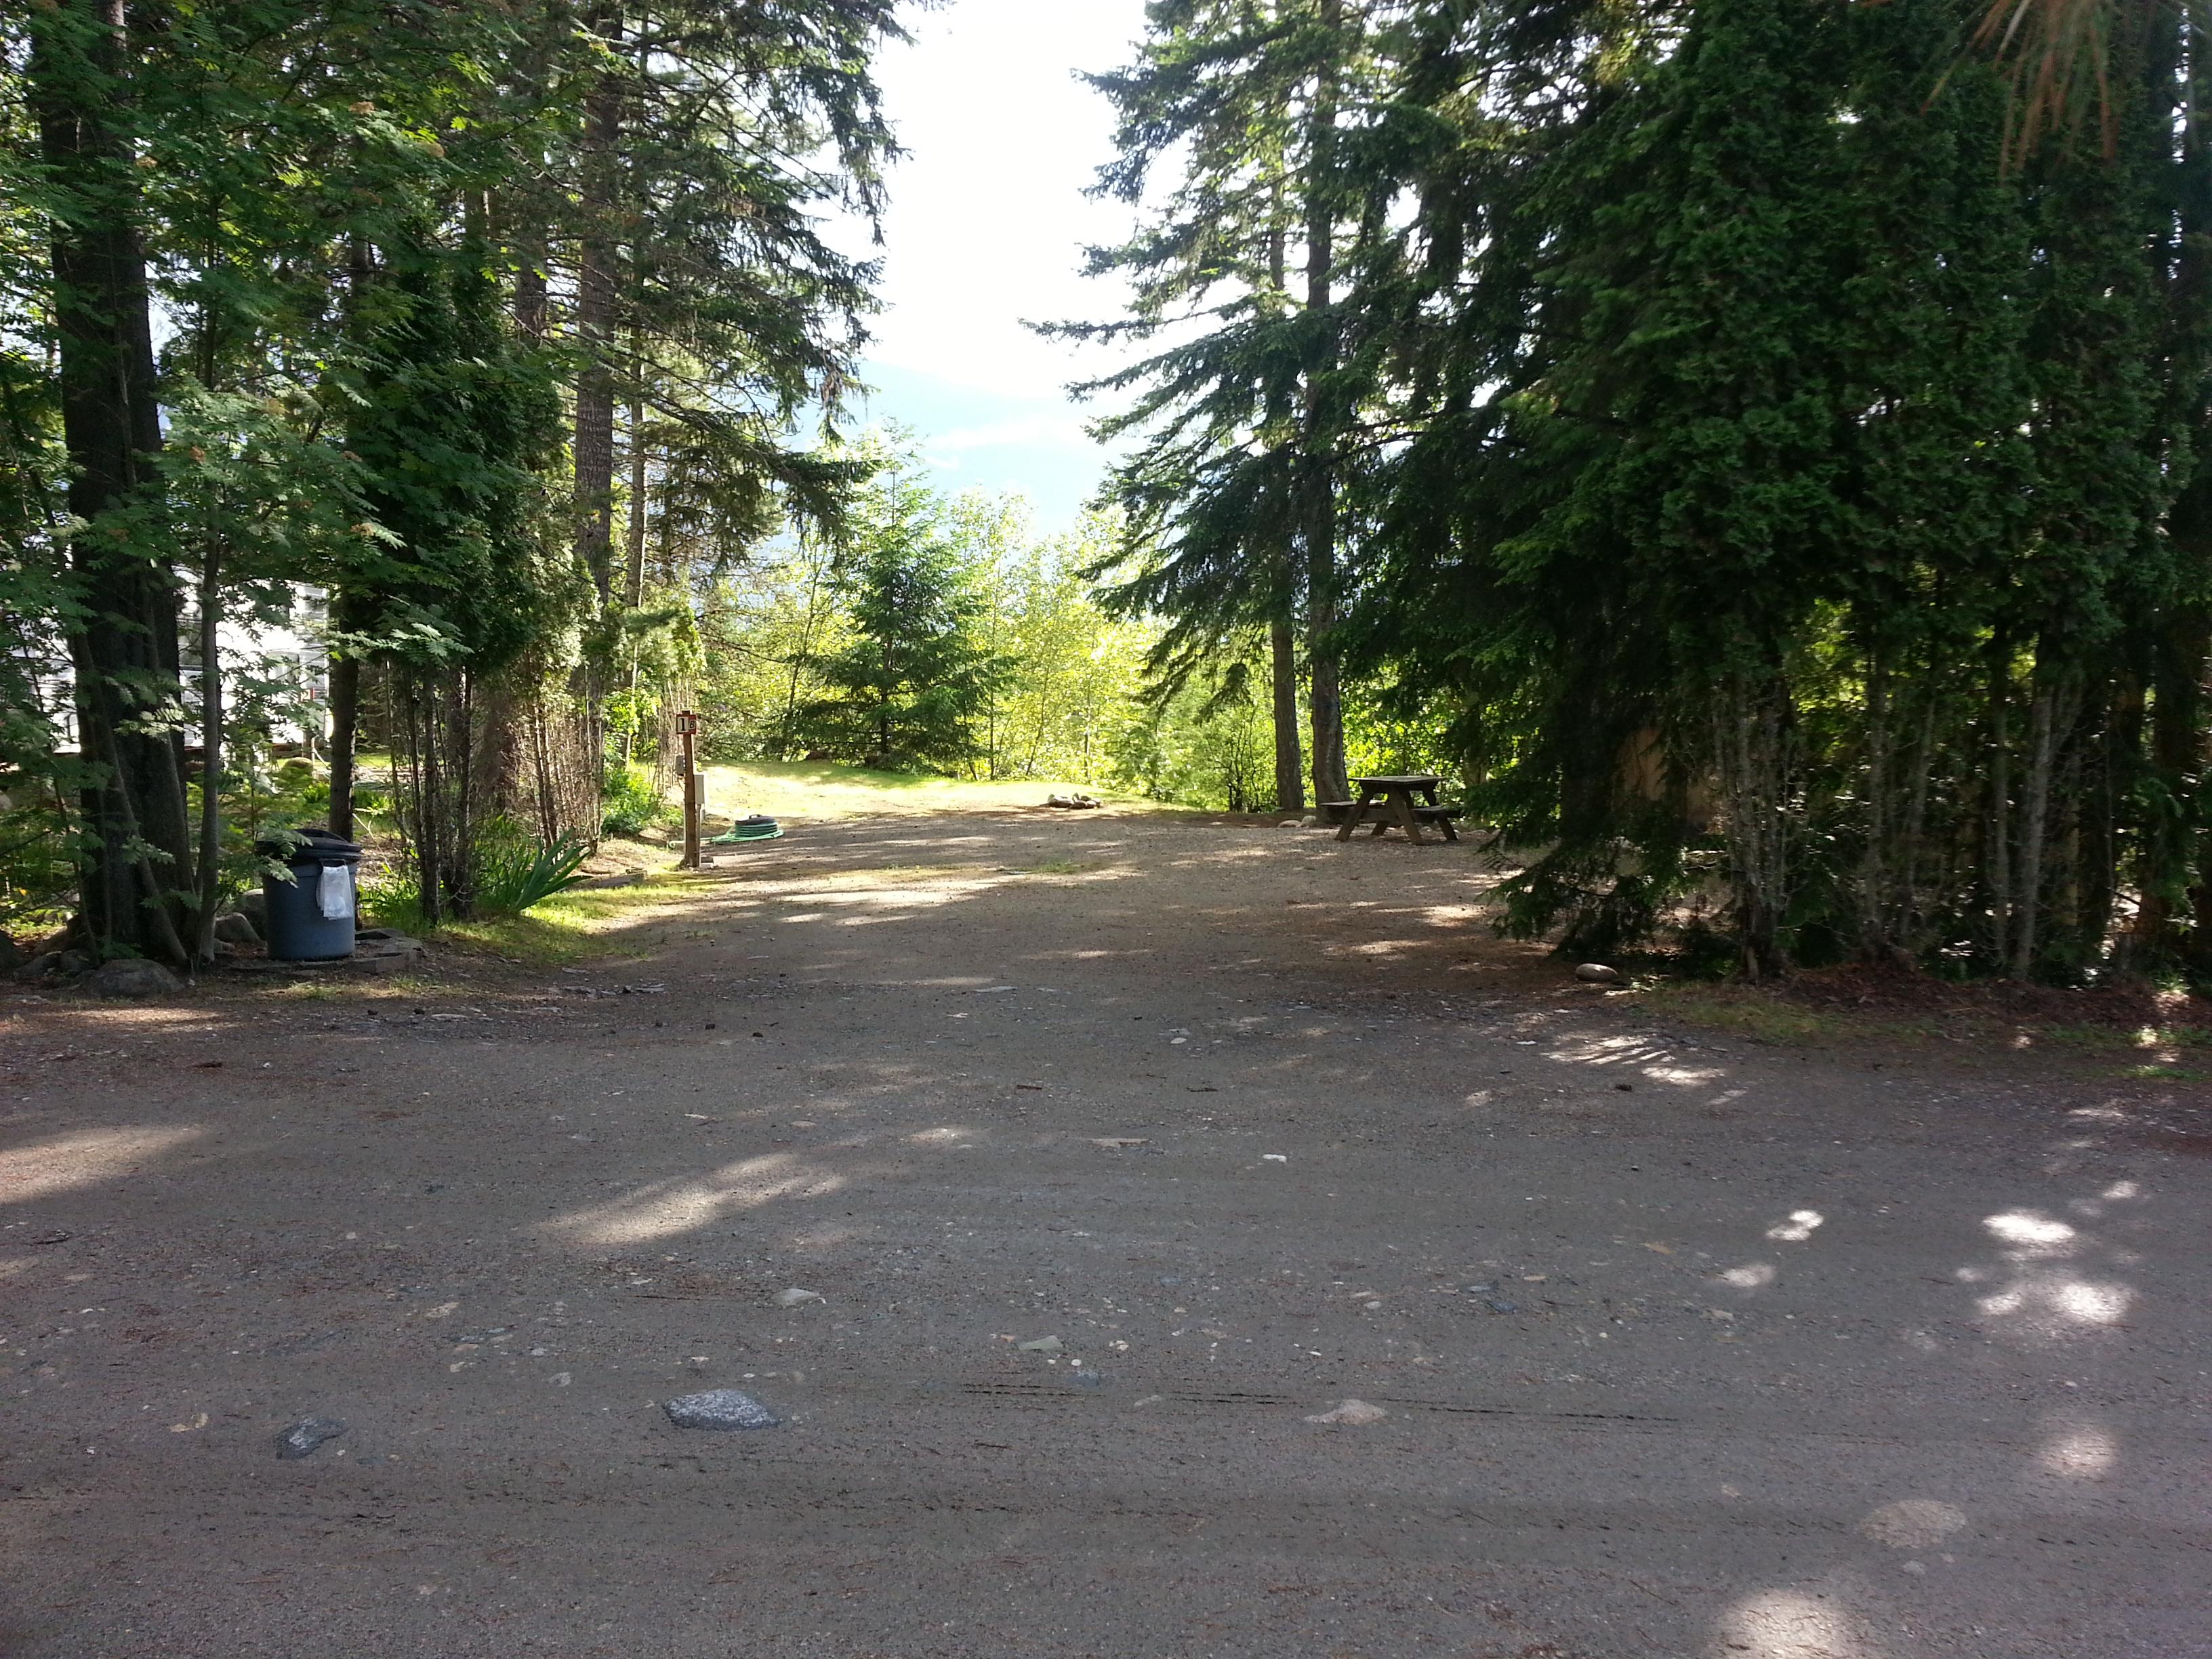 Driveway into 1B.jpg